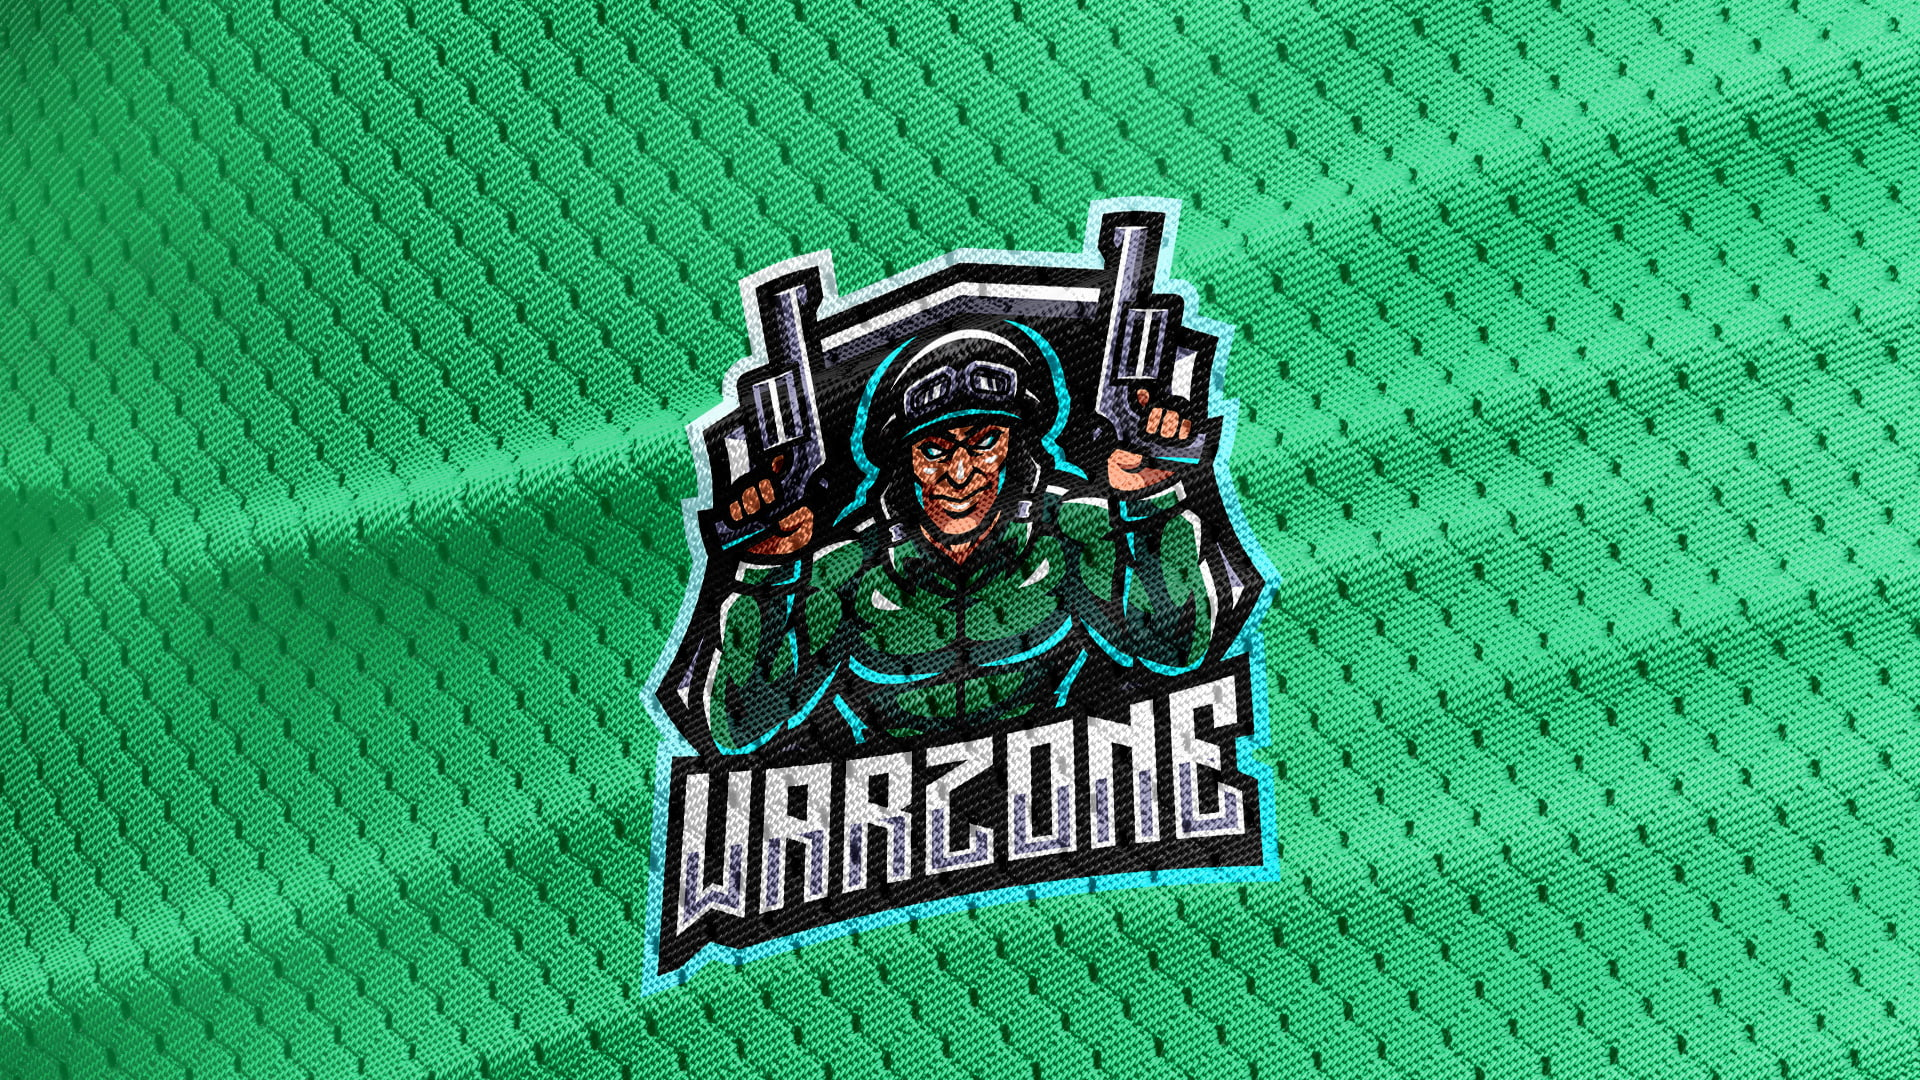 Green-Jersey-Texture-Free-Downloads-Warzone-Gaming-Mascot-Logo